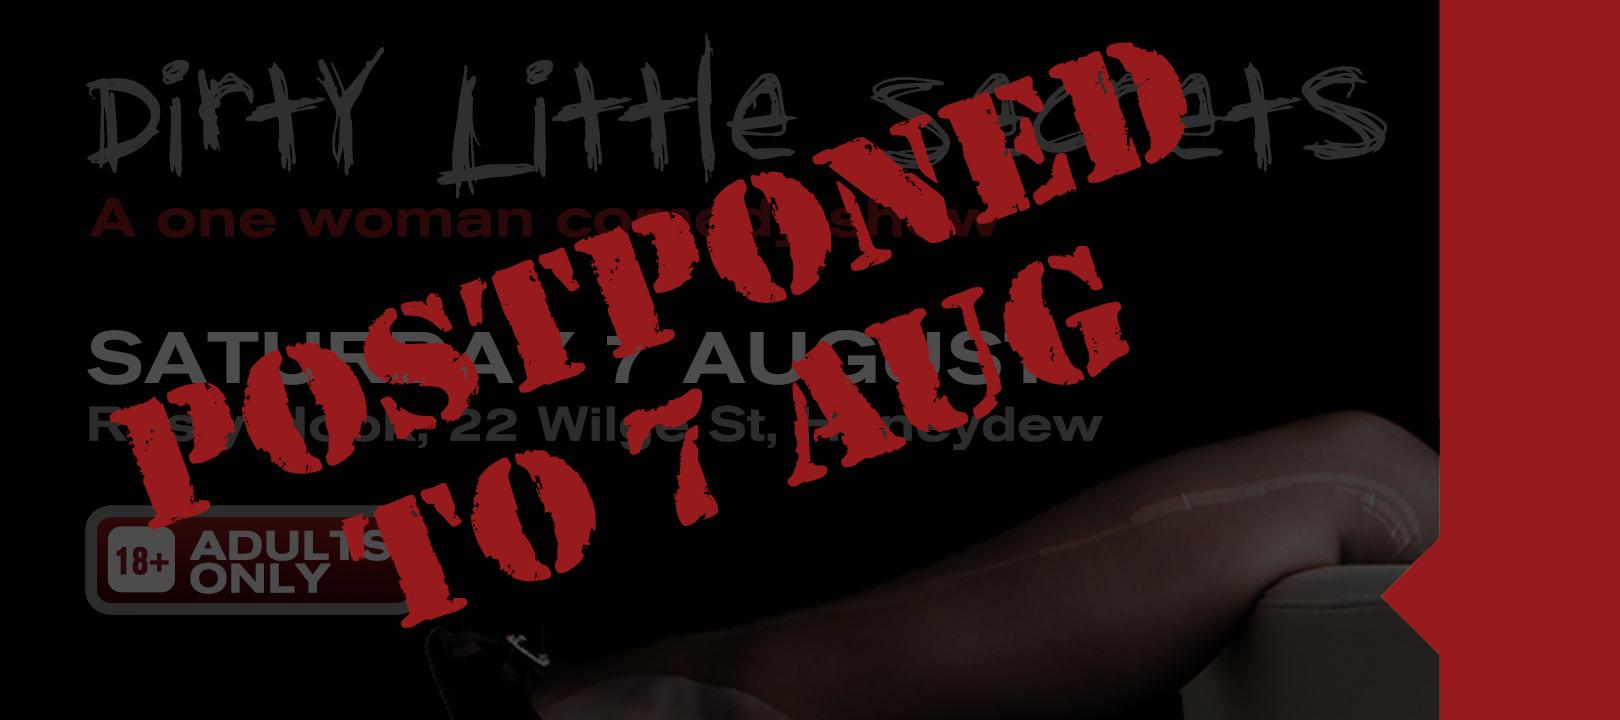 Dirty Little Secrets Unavoidably Postponed